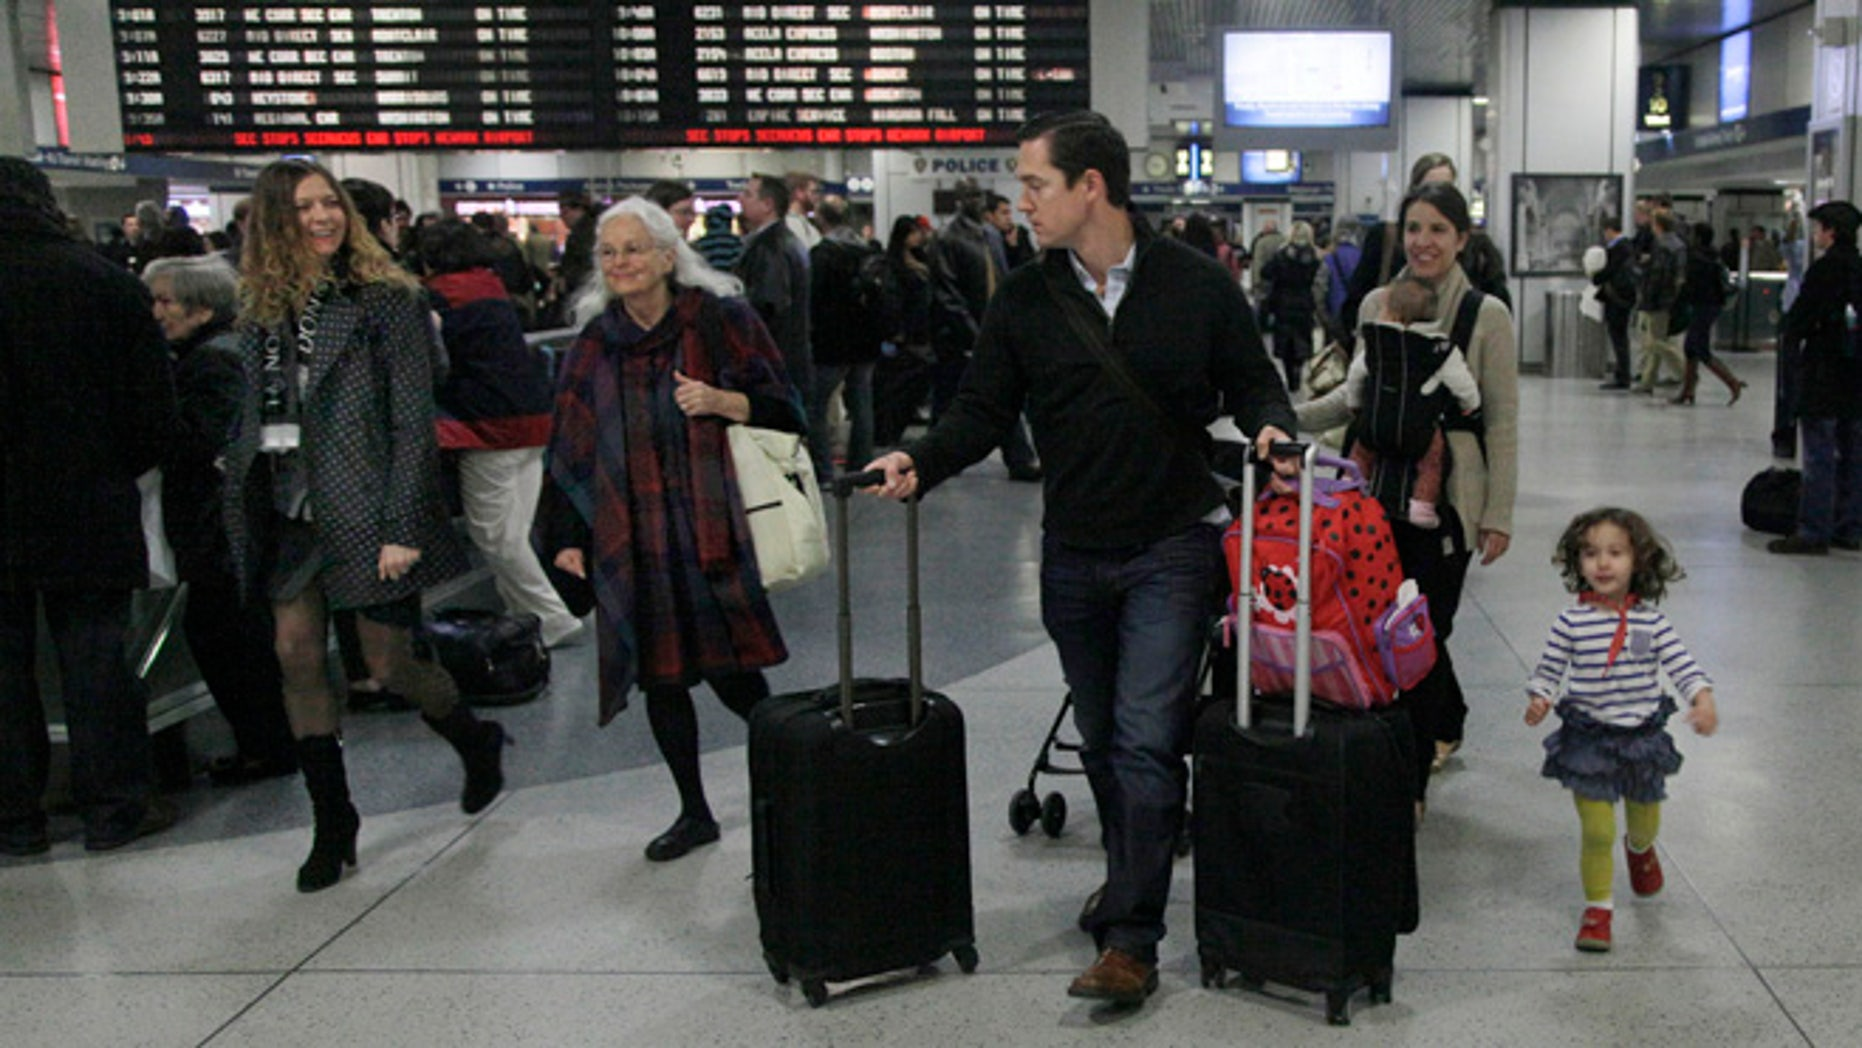 Nov. 21, 2012: Travelers walk through New York's Penn Station.